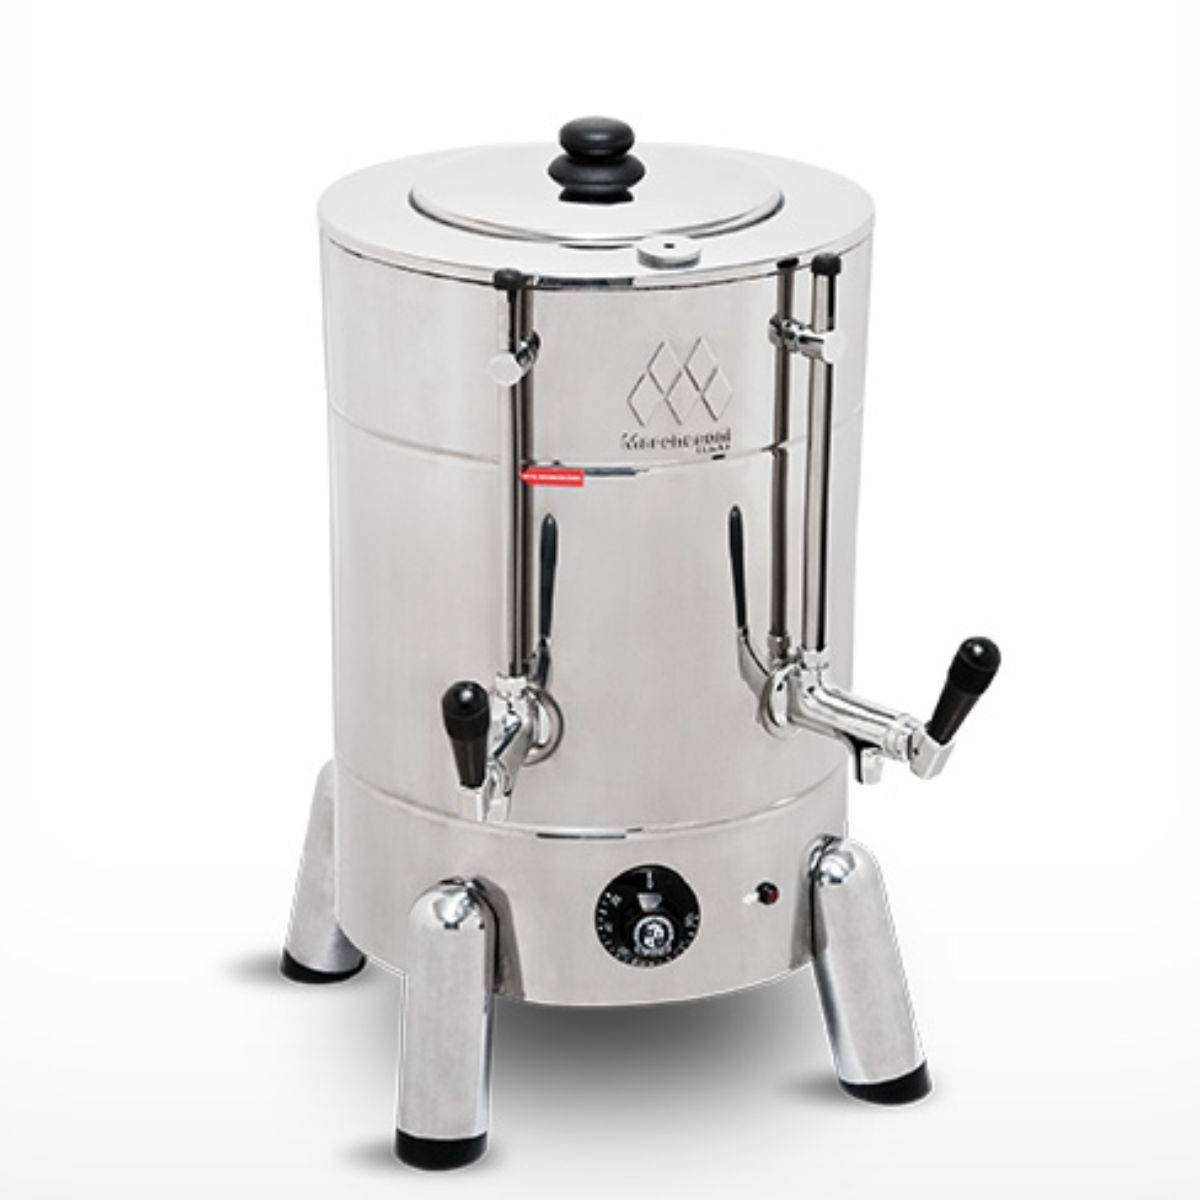 Cafeteira Elétrica Tradicional 2 Litros Marchesoni